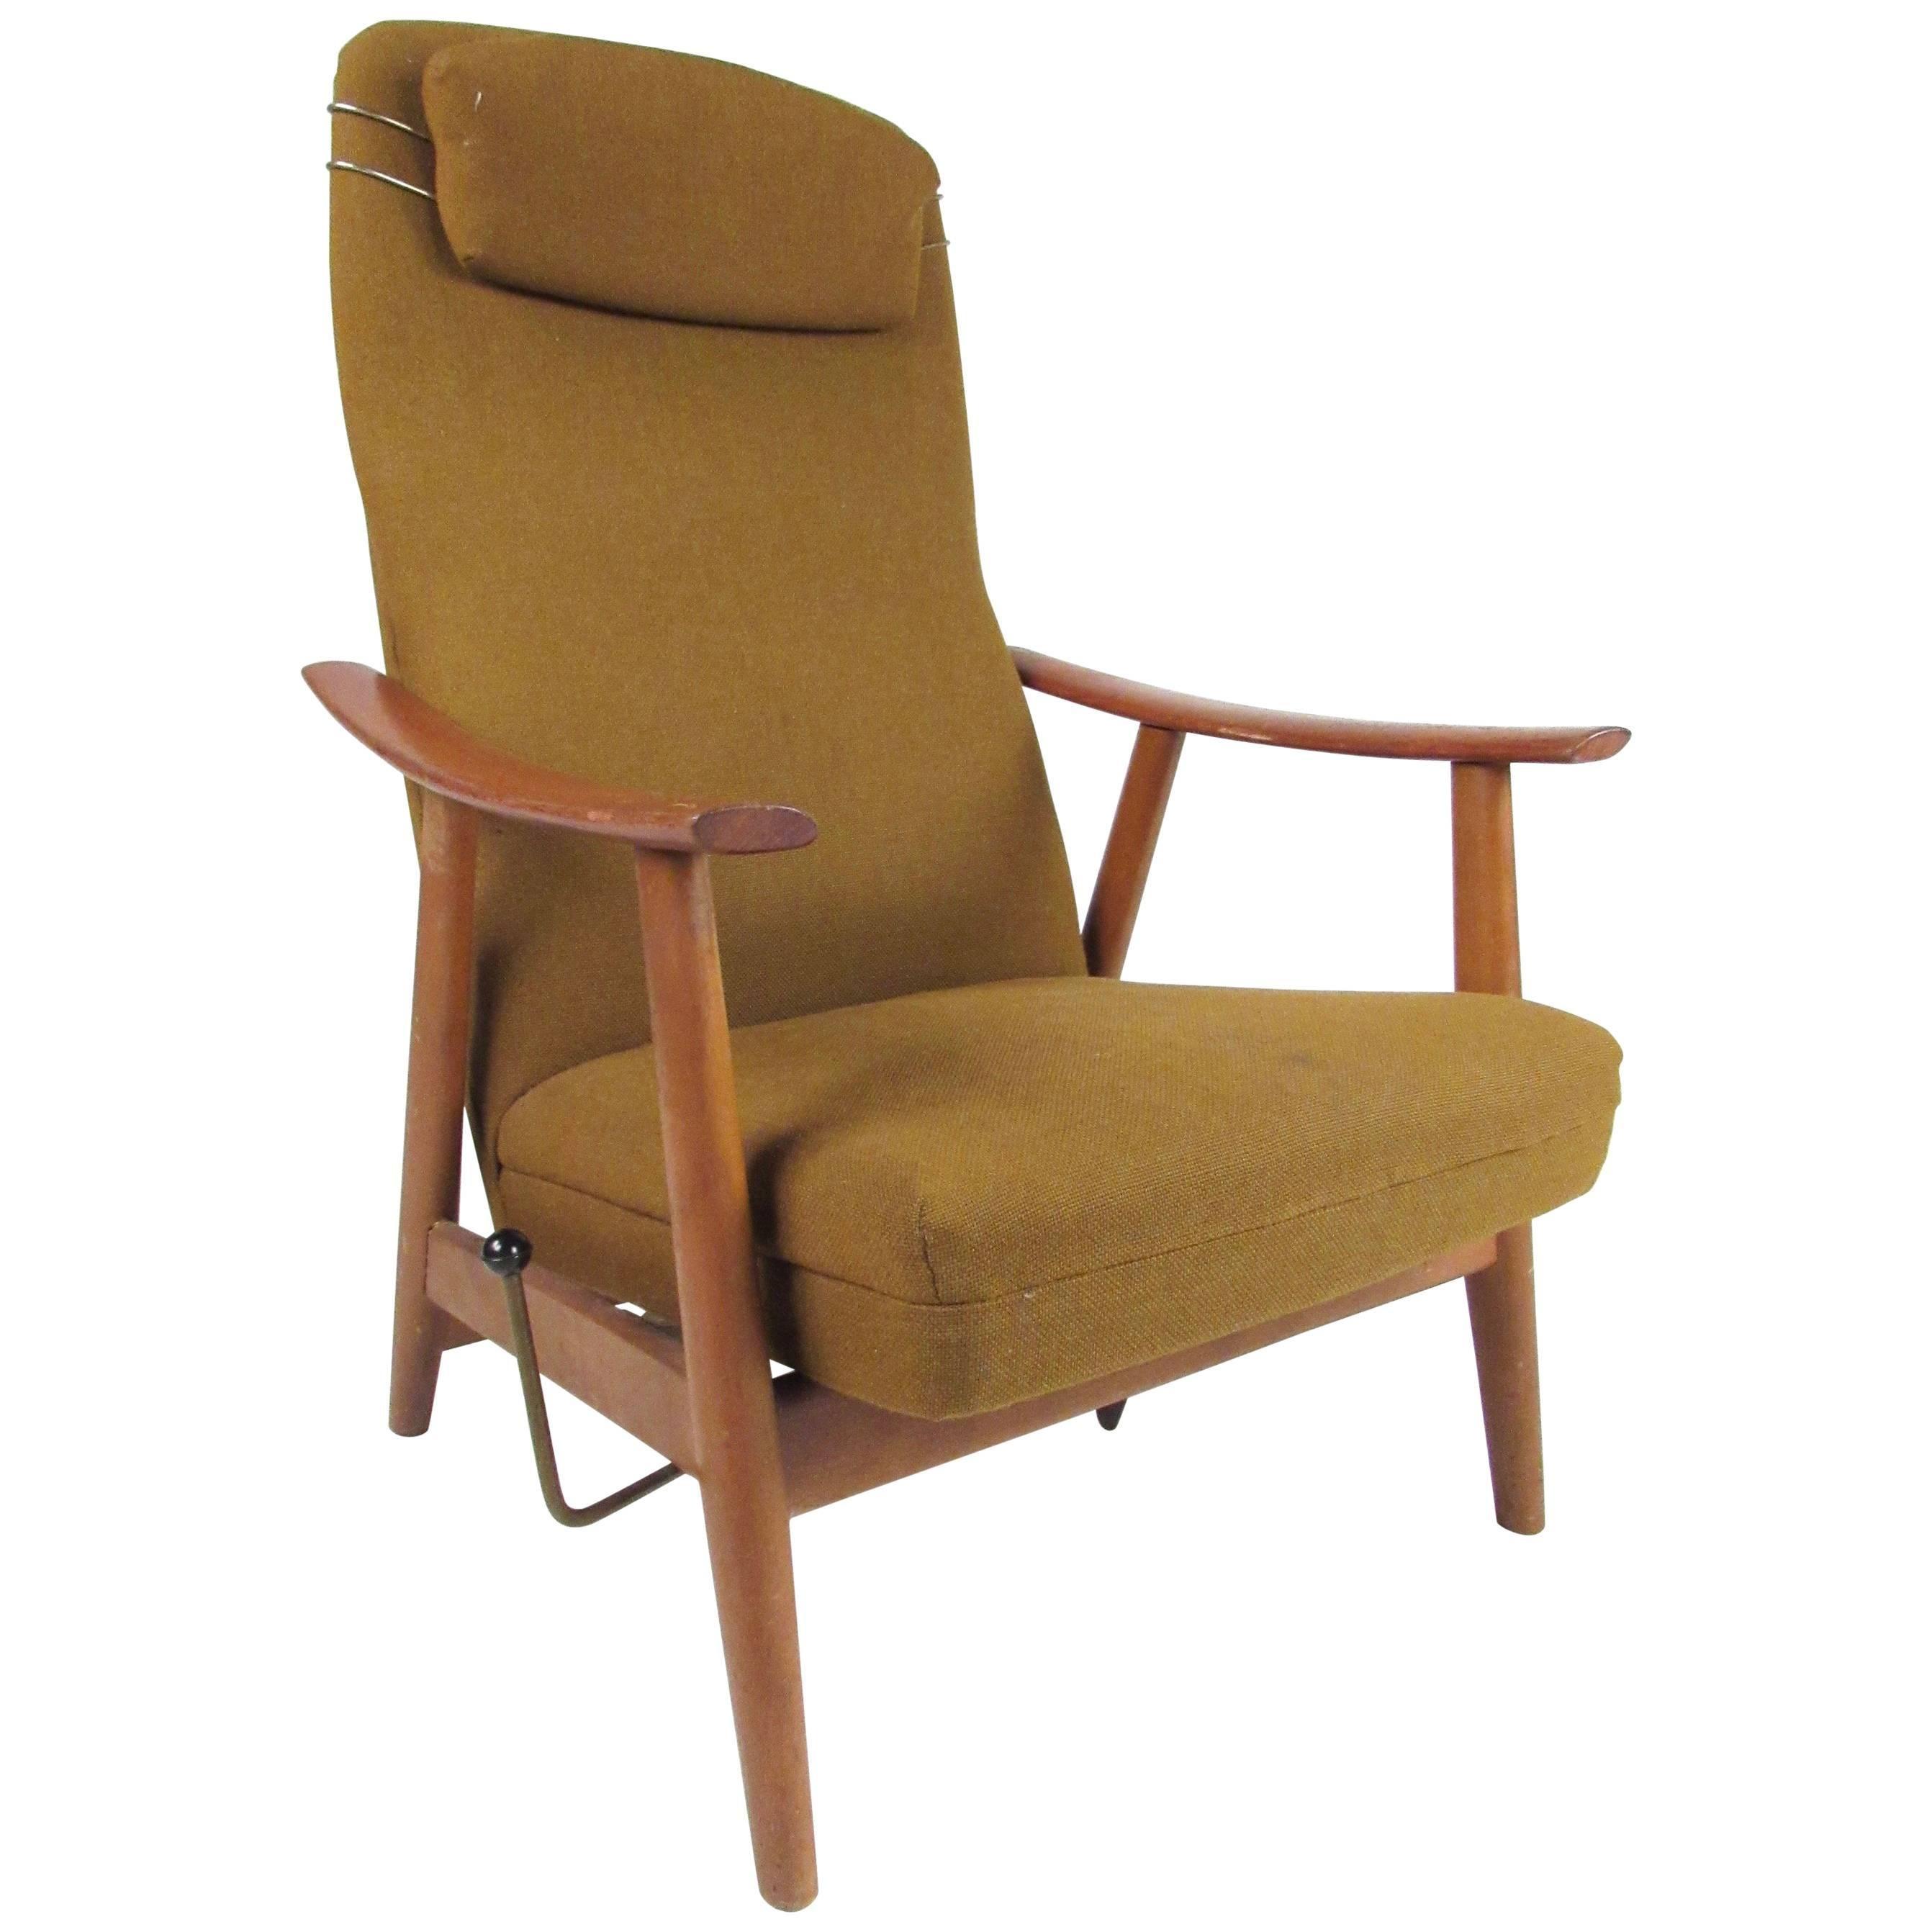 Tall Danish Modern Lounge Chair